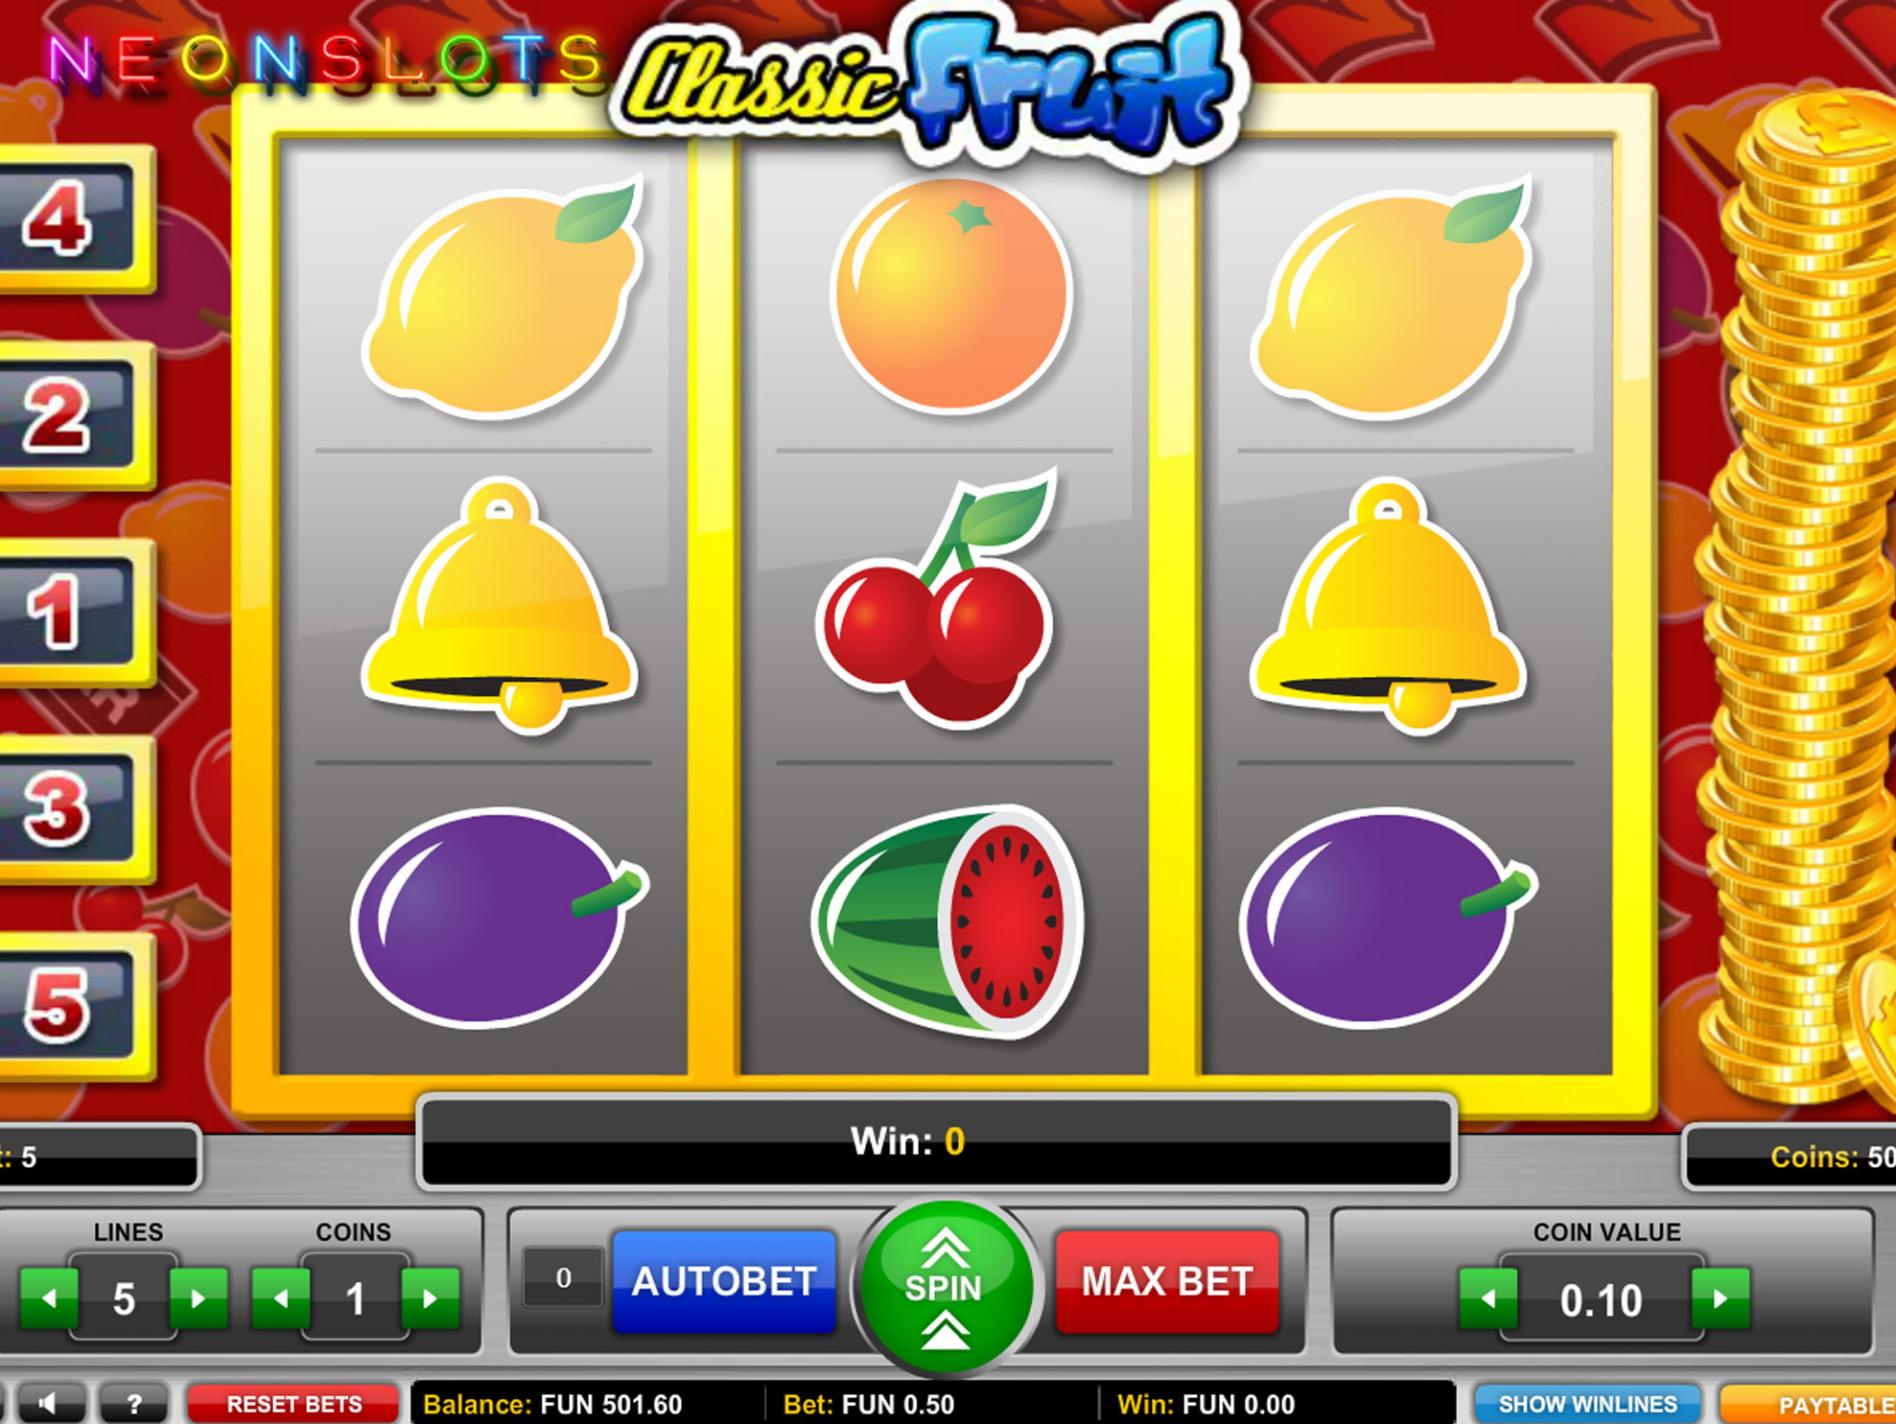 Tragamonedas 5 tambores casino online legales en Ecatepec - 80471